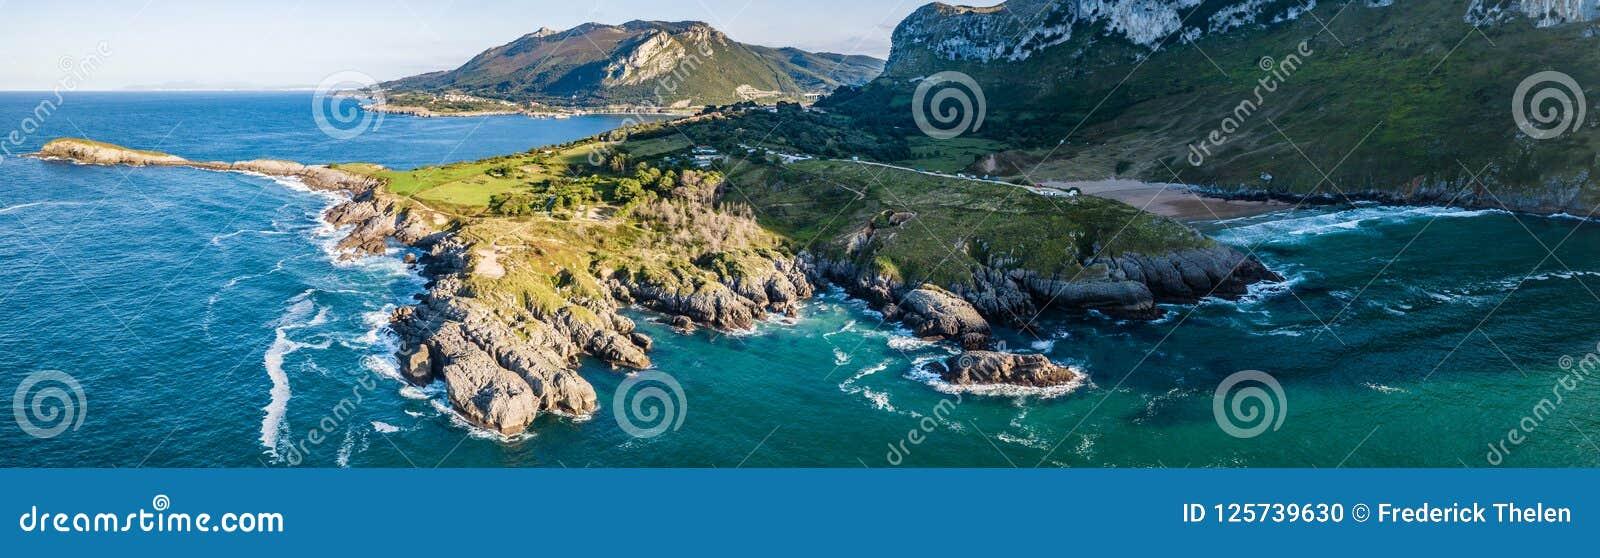 Somo Surfspot Spain Vanlife Stock Photo - Image of atlantic